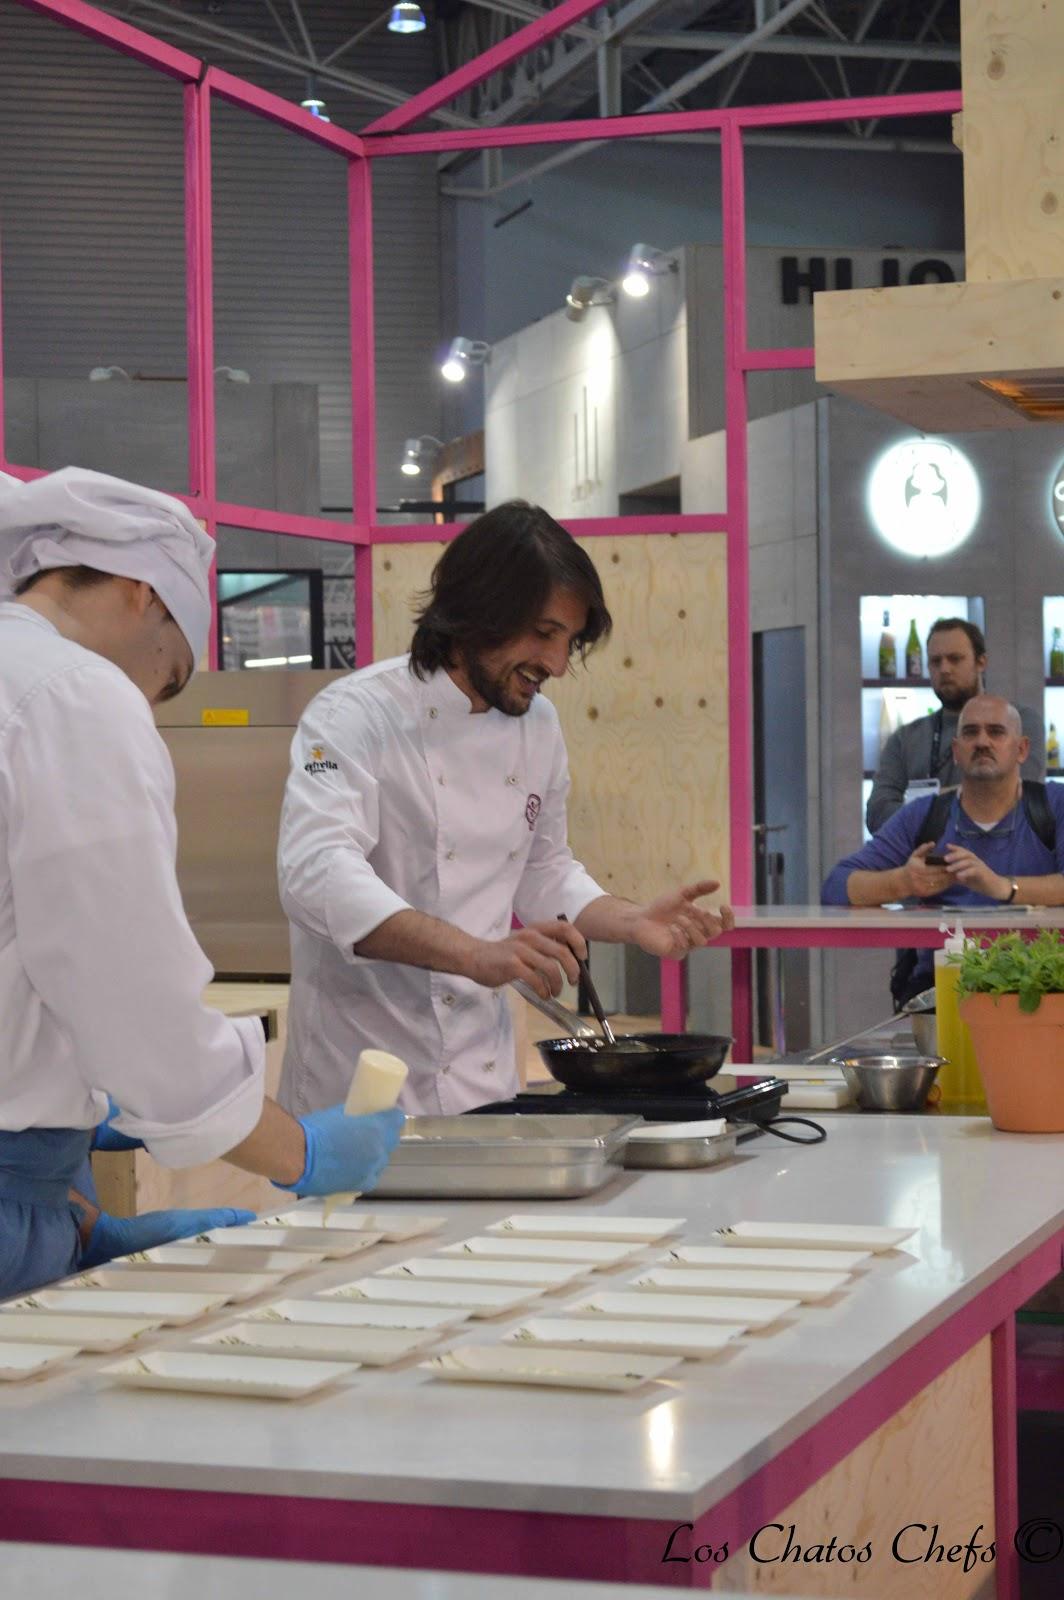 Los chatos chefs barcelona for Cocinar ortiguillas